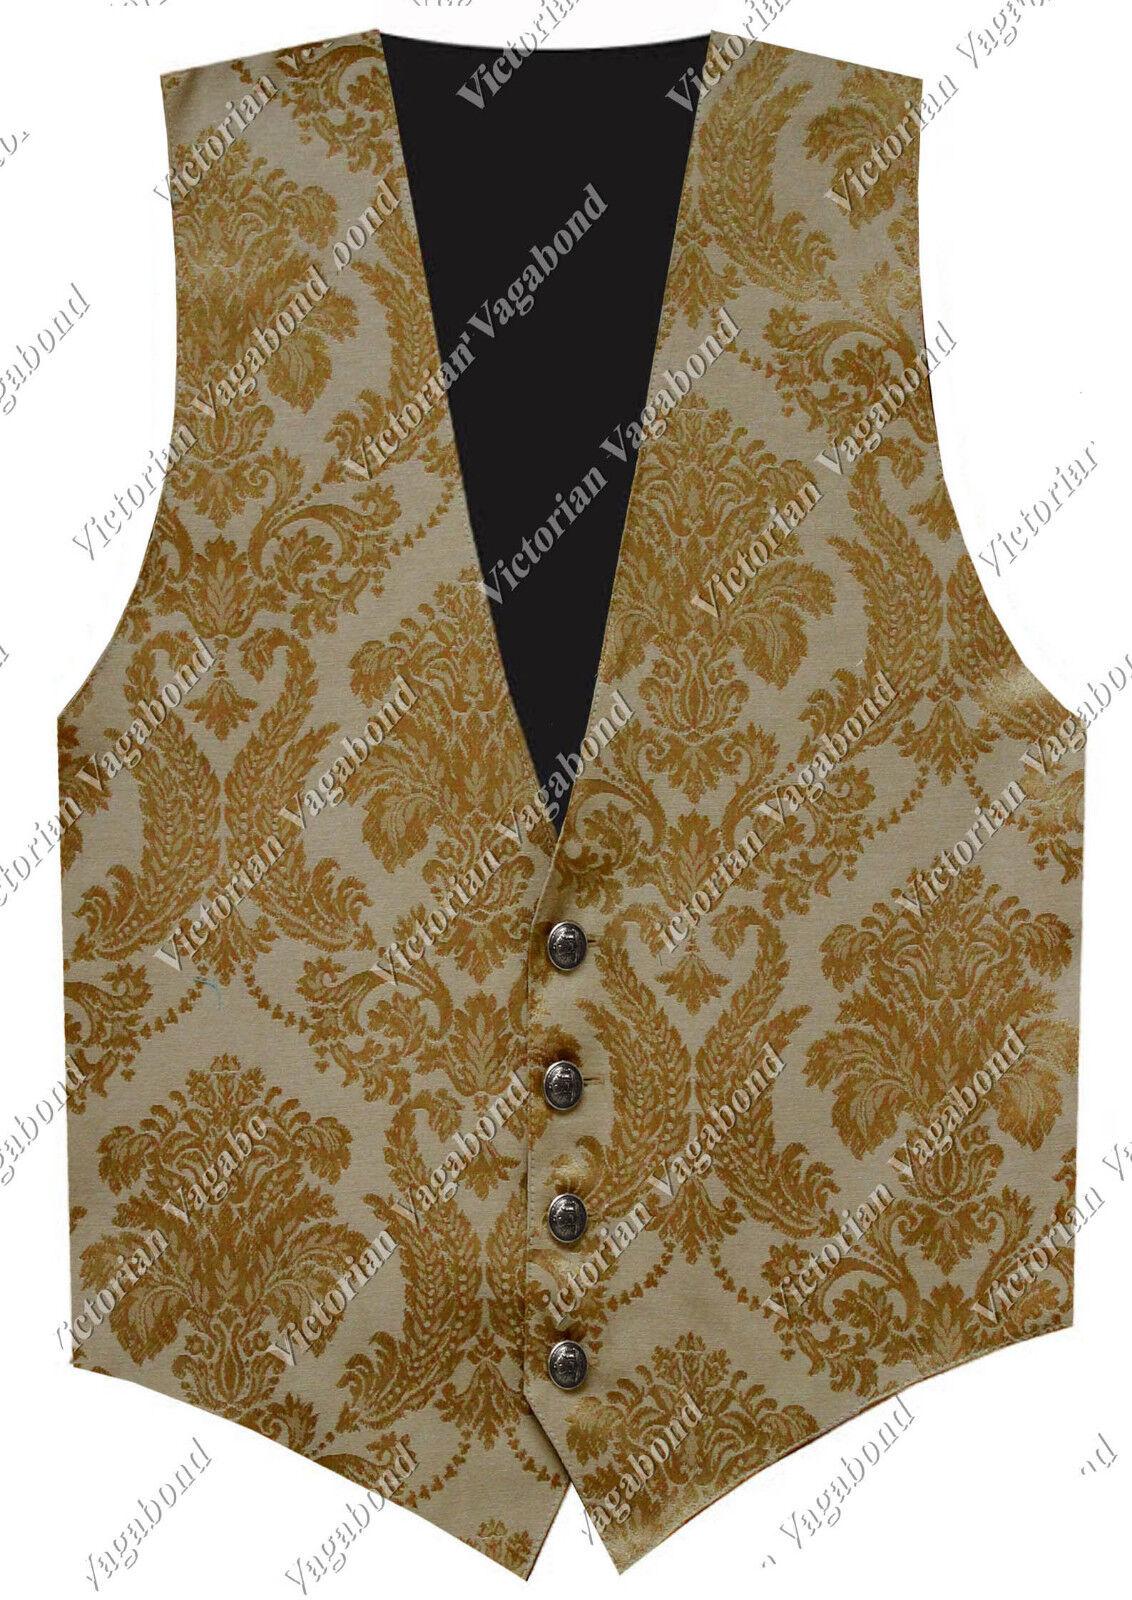 SteamPunk Men gold Gothic Historical Western Pirate Brocade Vest Waistcoat